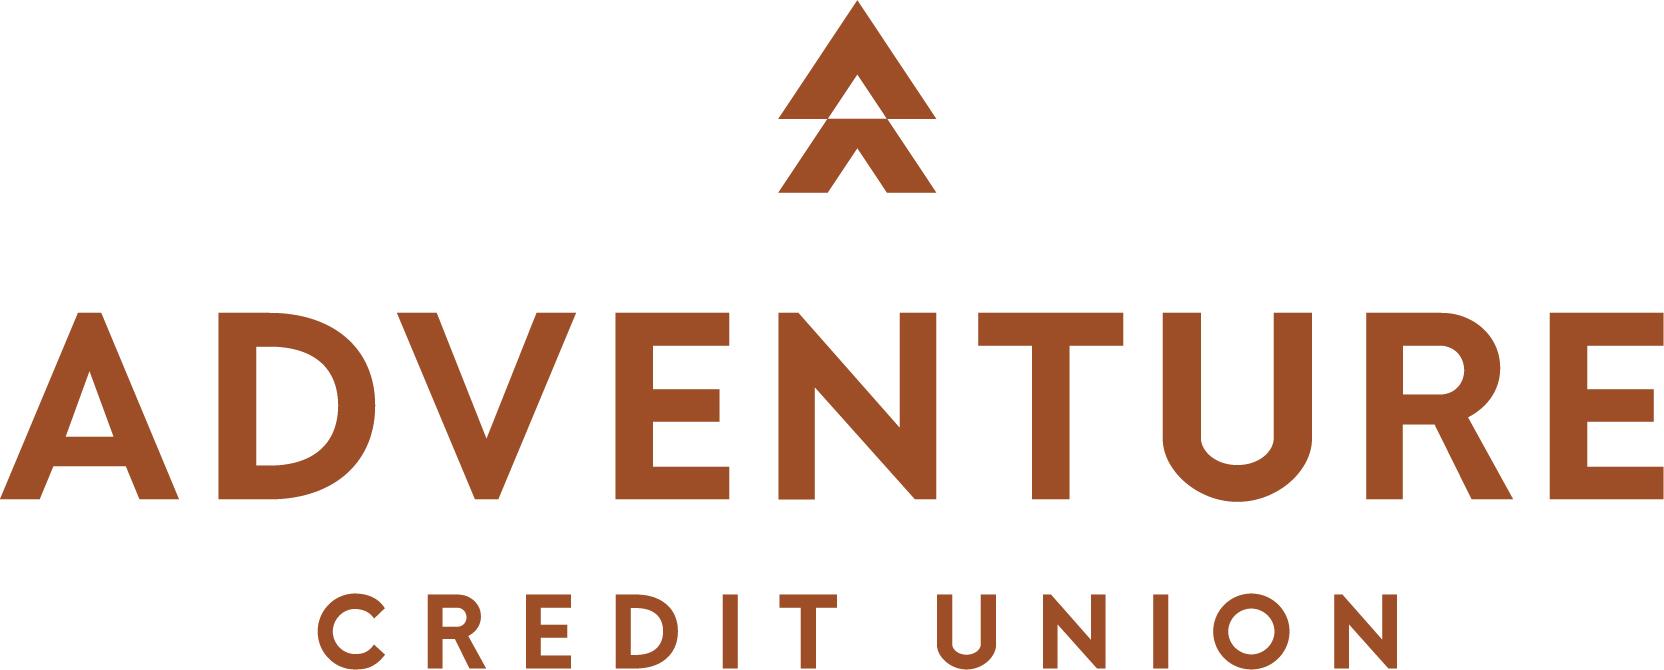 Adventure_Credit_Union_Logo_Copper large.jpg